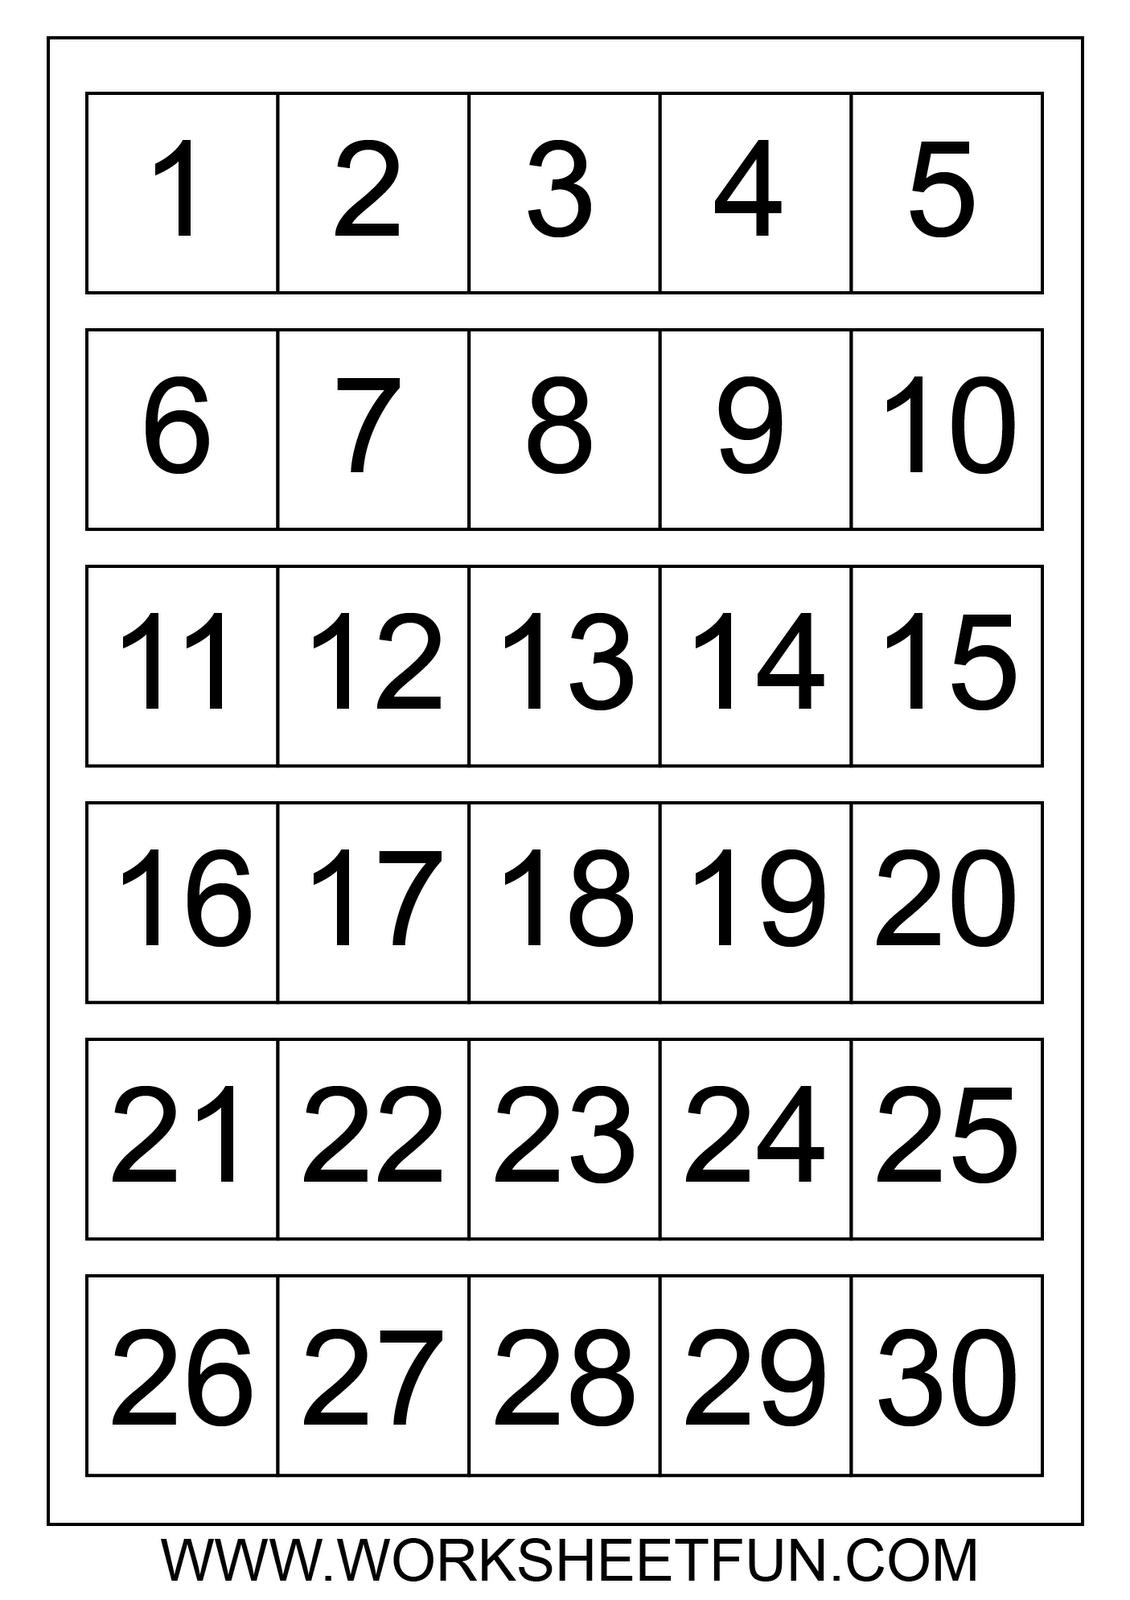 Printable Calendar Pieces To 31 - Calendar Inspiration Design